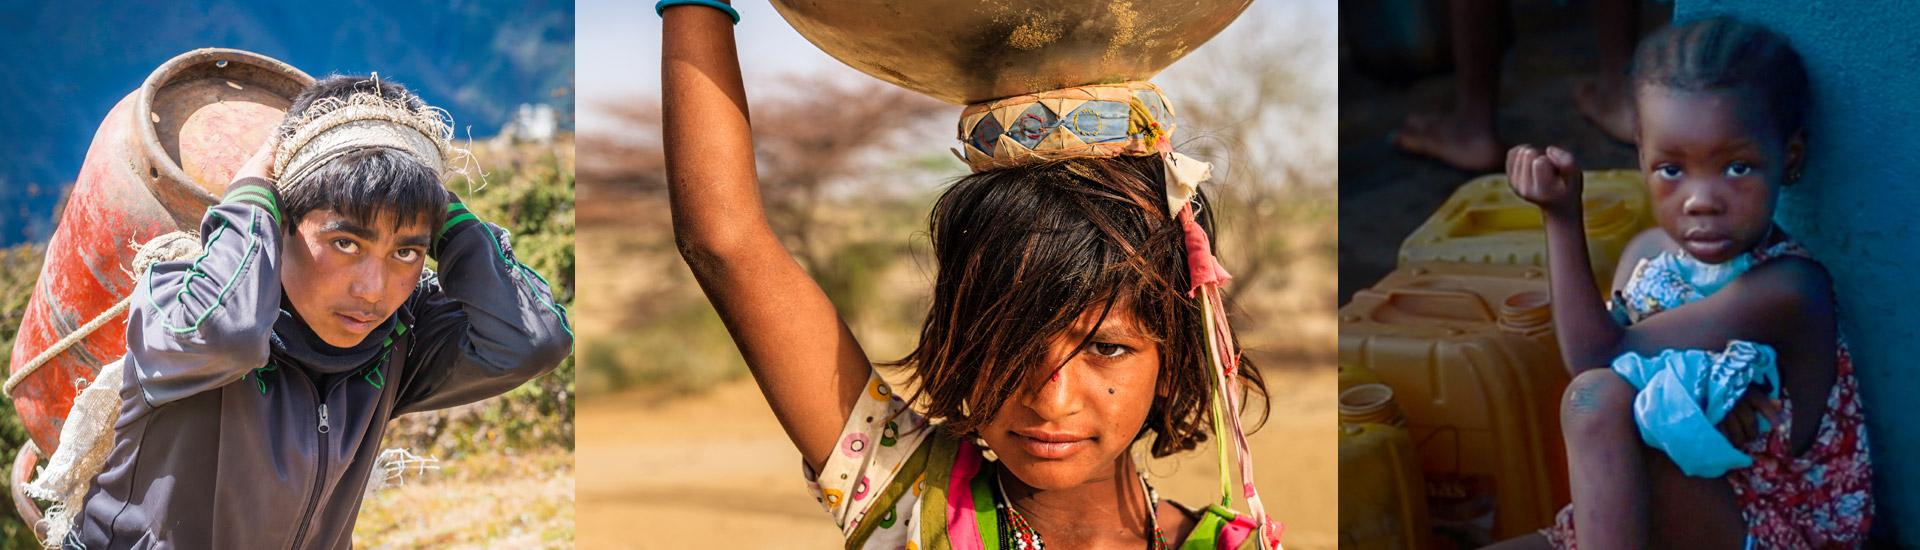 Día contra la Esclavitud Infantil